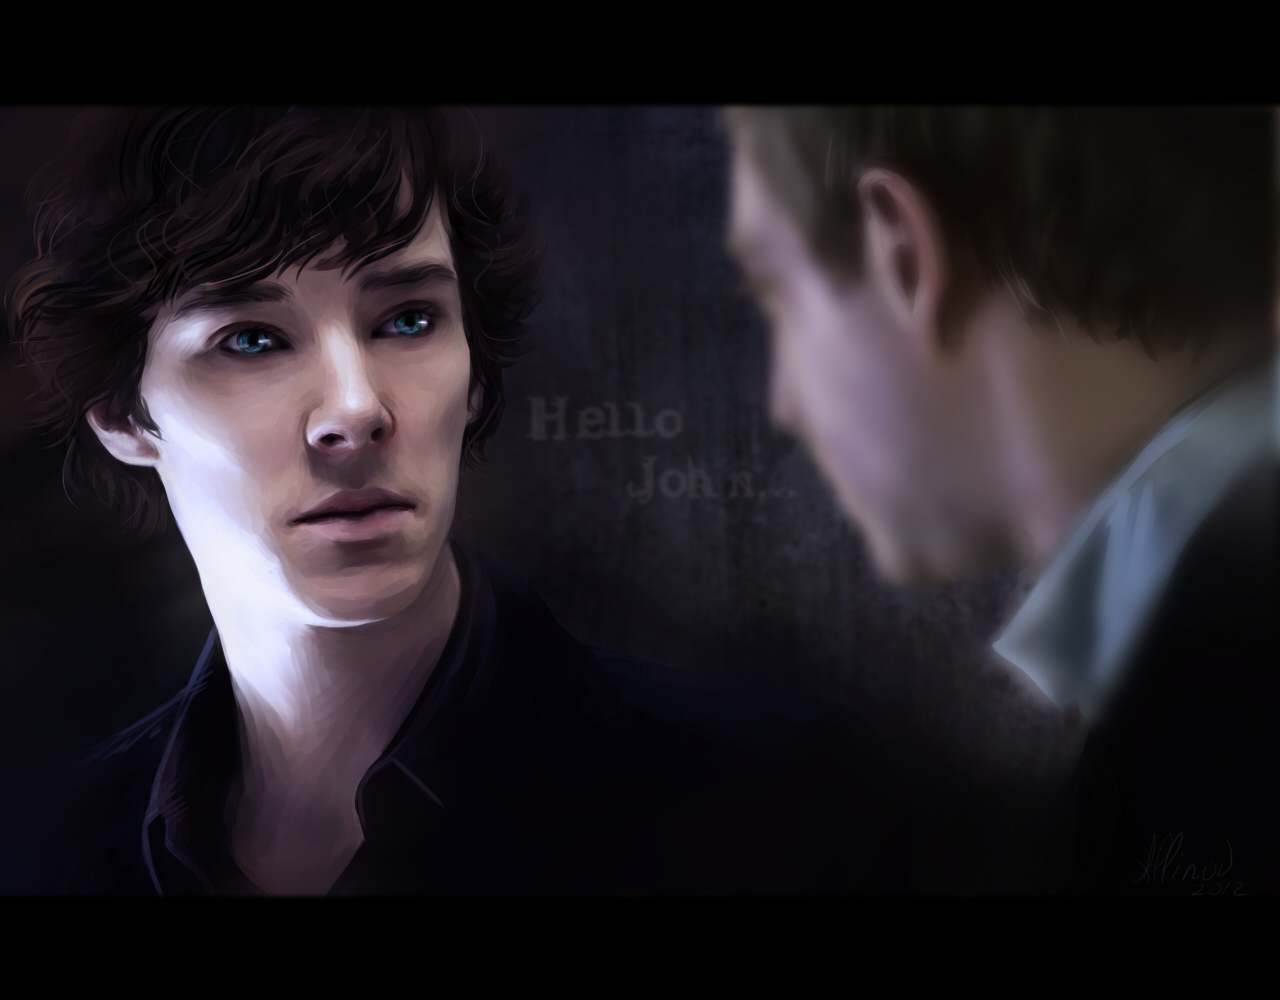 Hello, John... by Allinor